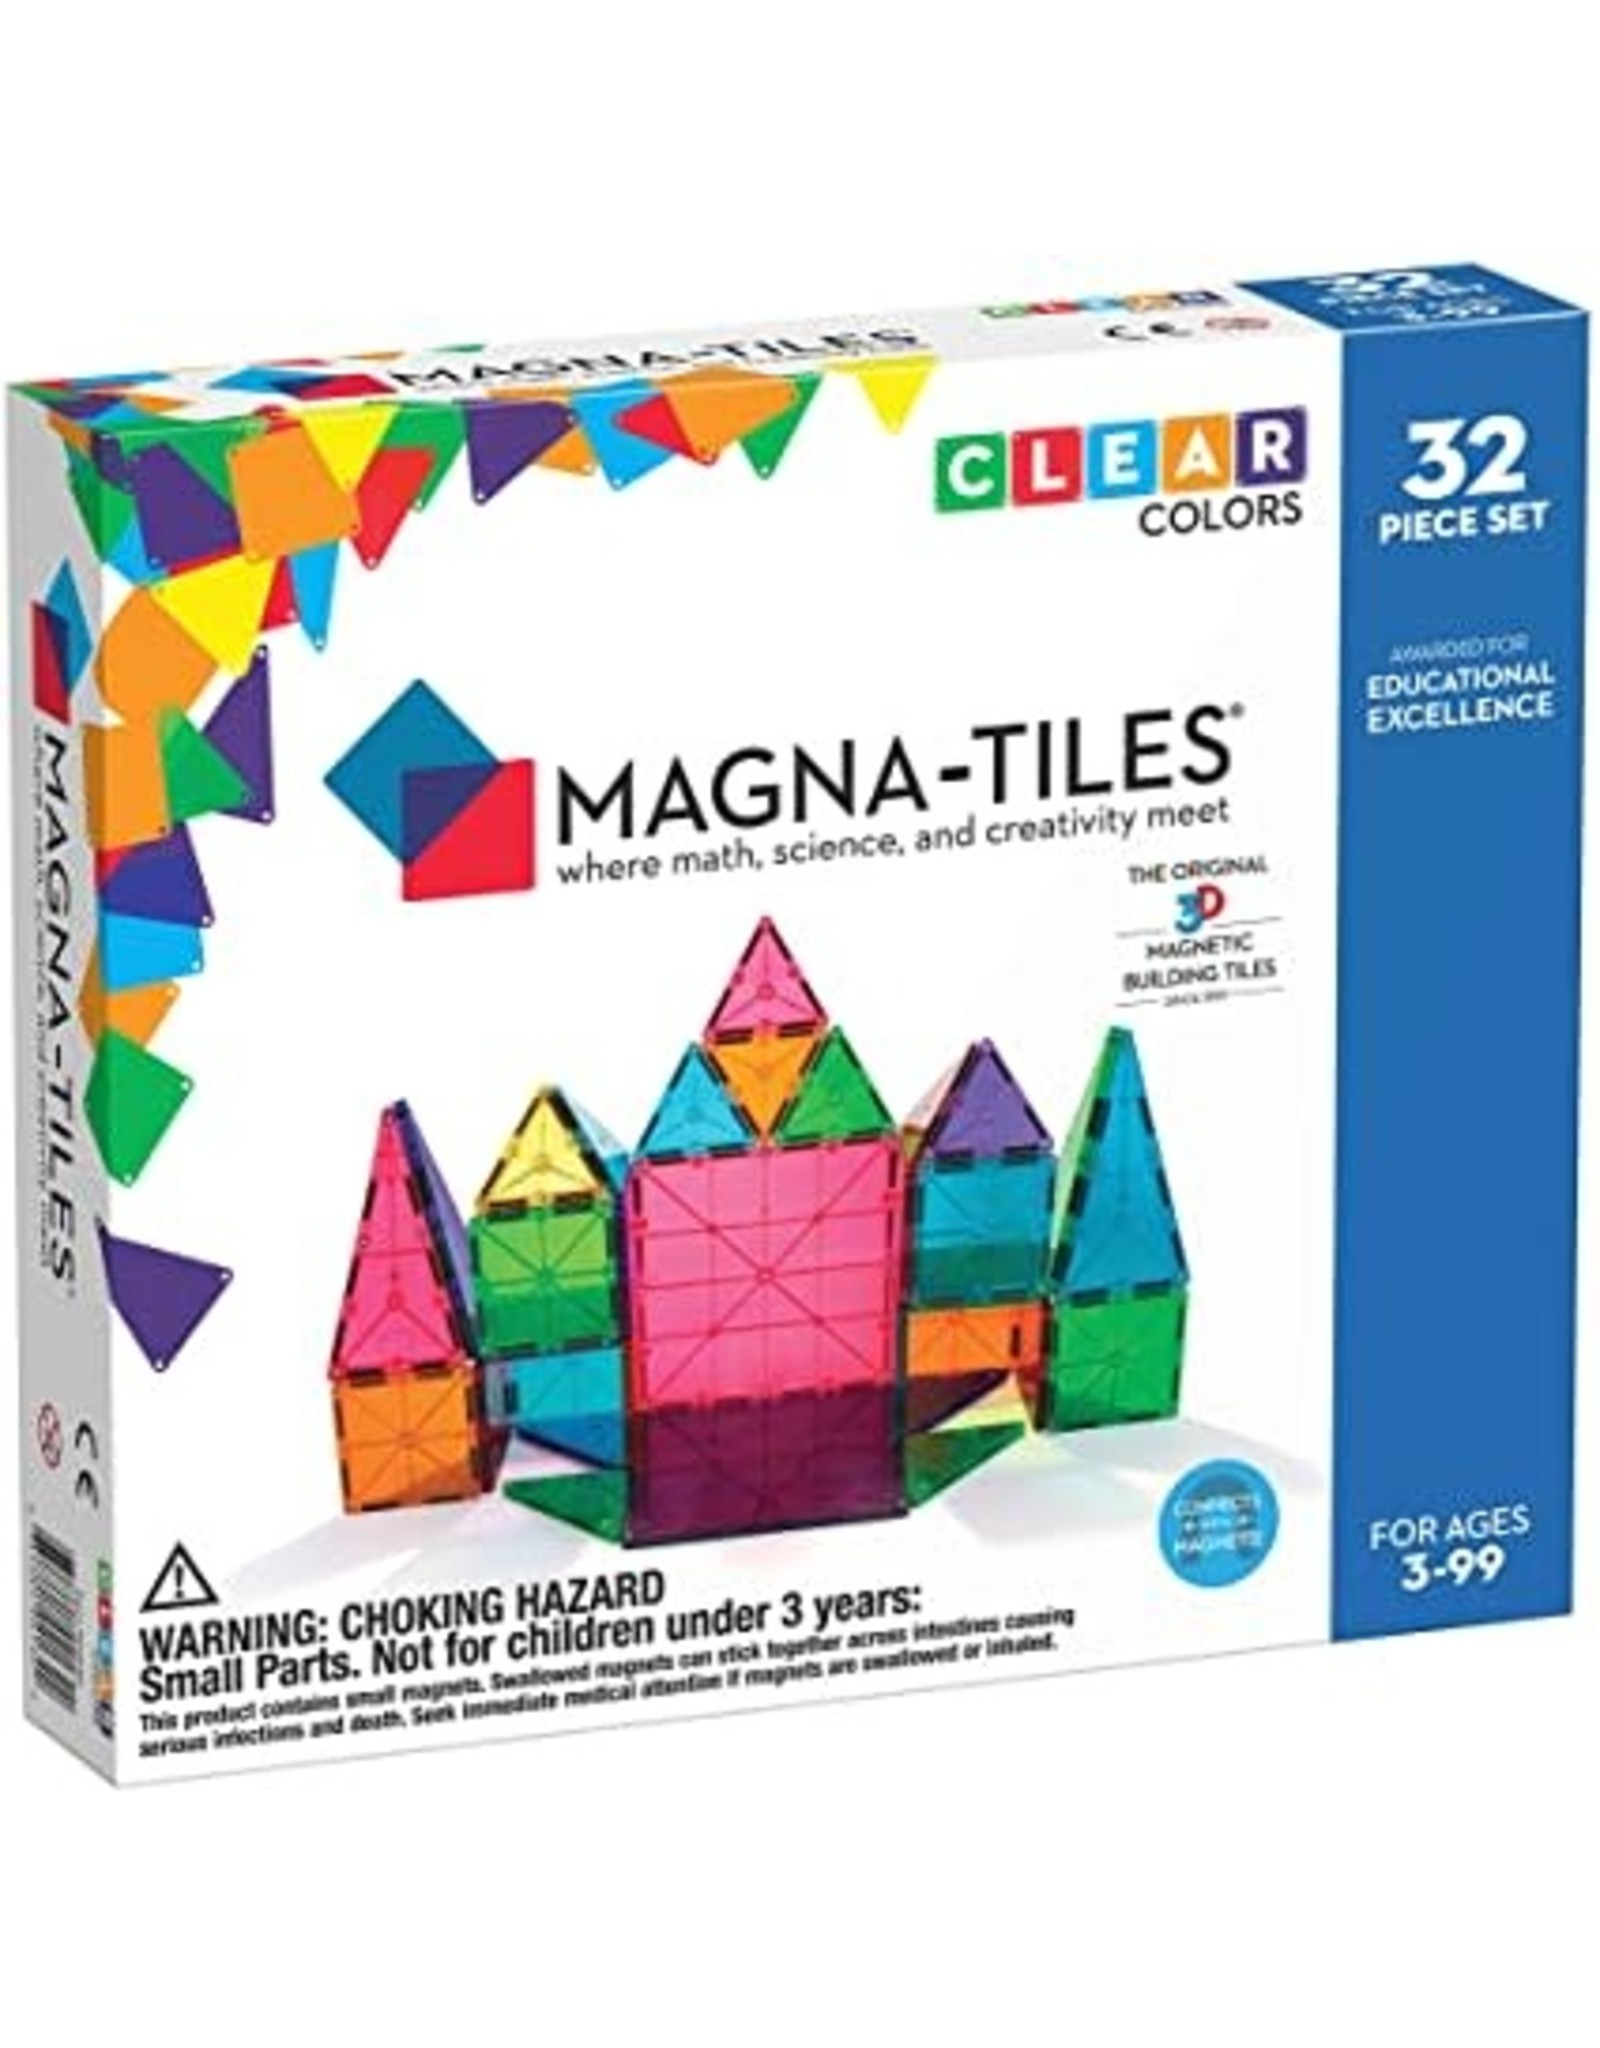 Magna-Tiles Magna-Tiles Clear Colours 32 pc